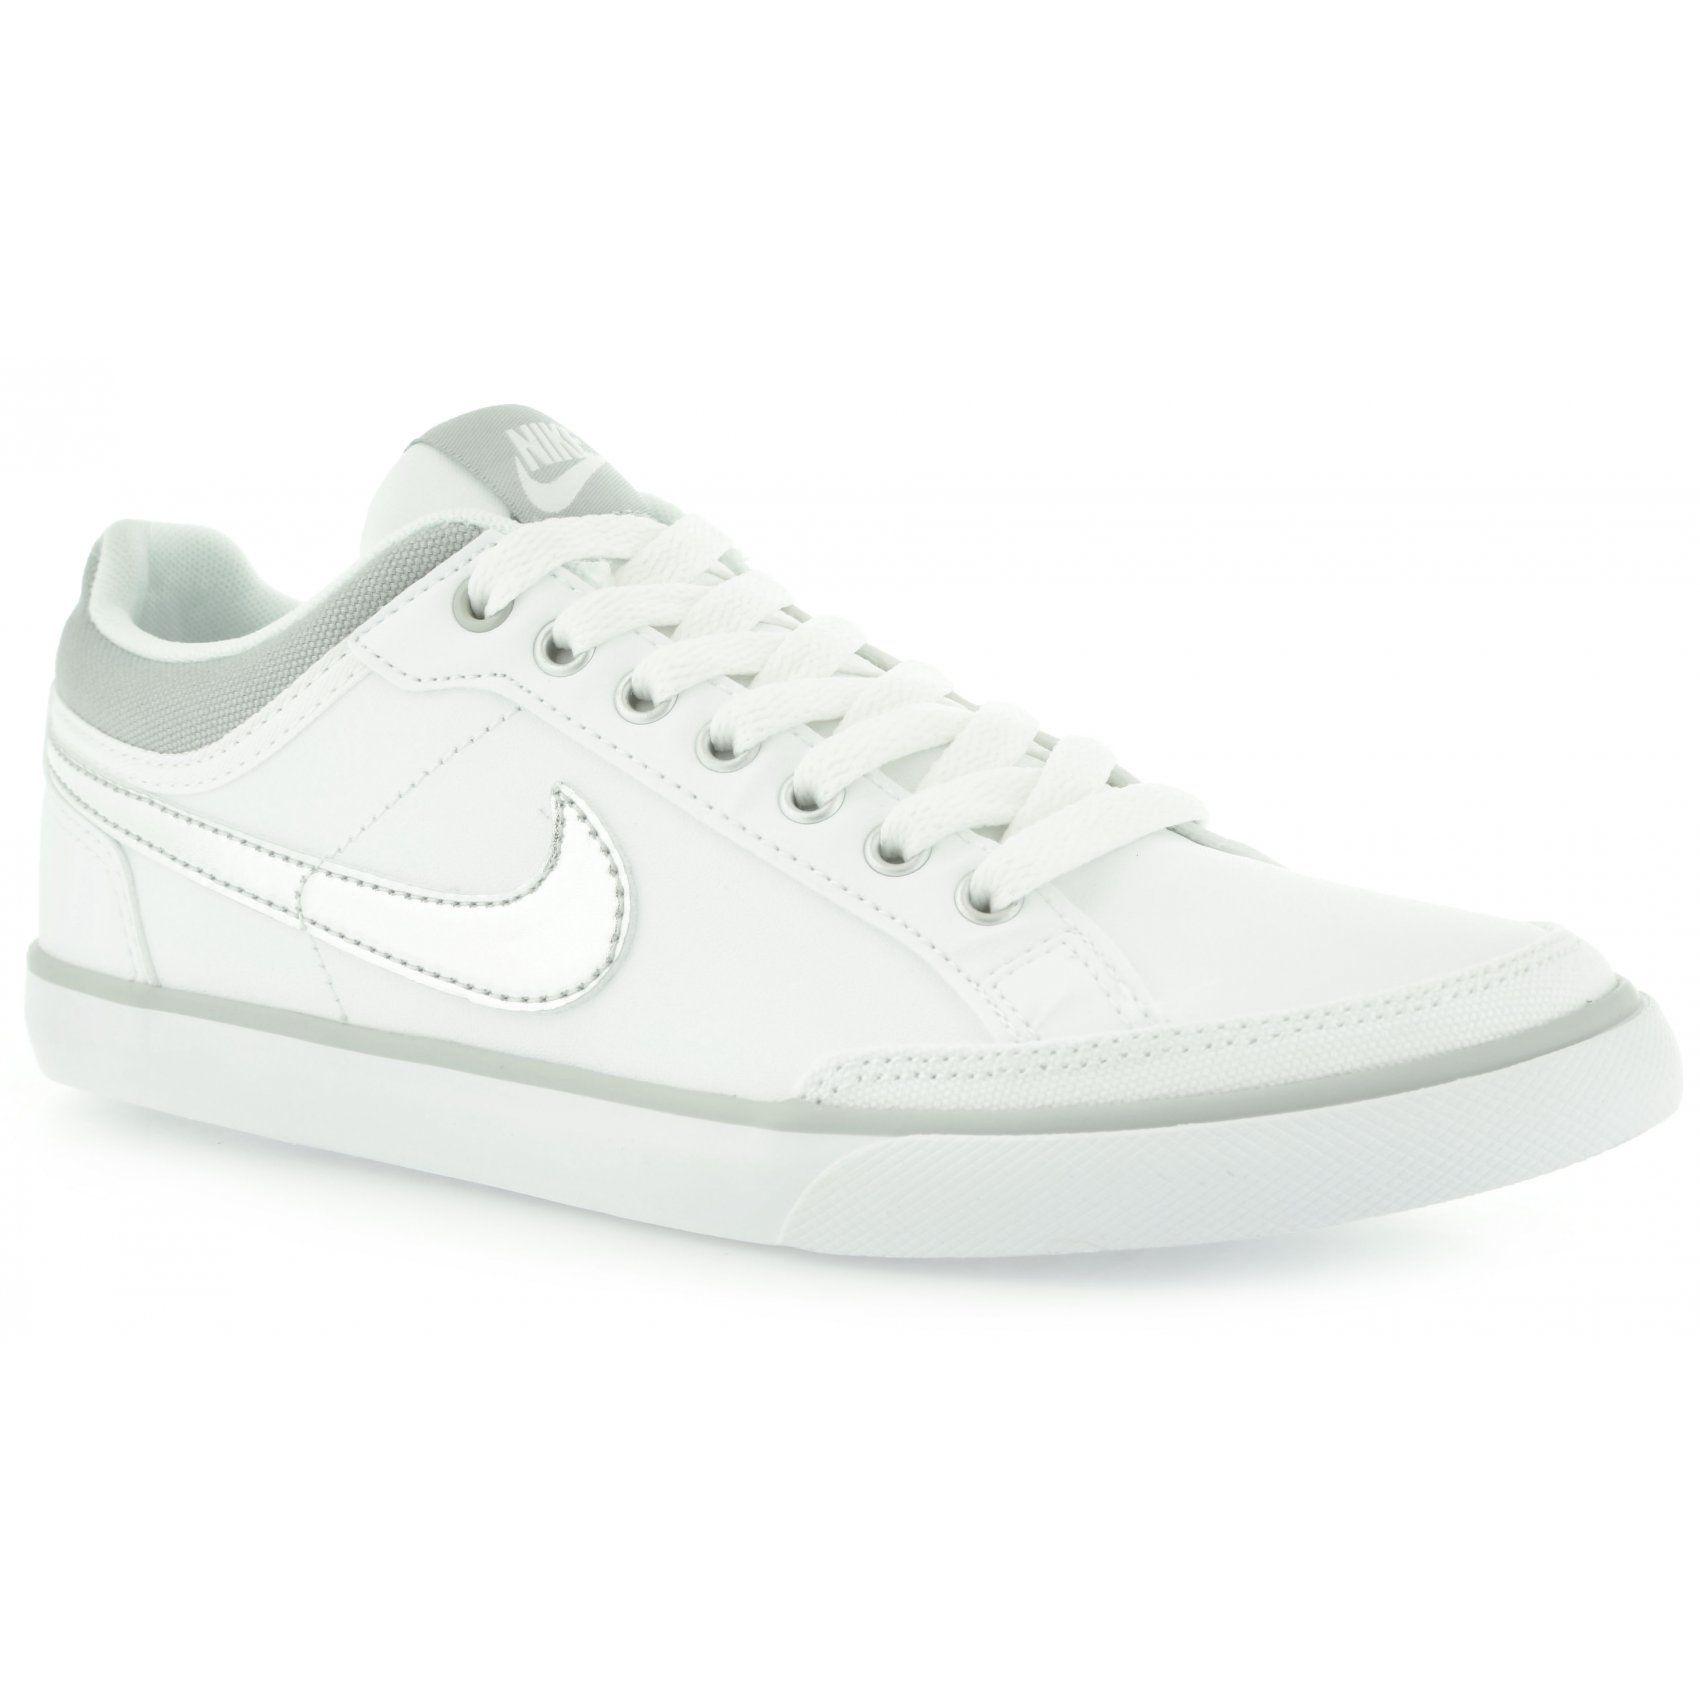 Nike Capri 3 Girls Trainers Shoes White/Fuchsia BX